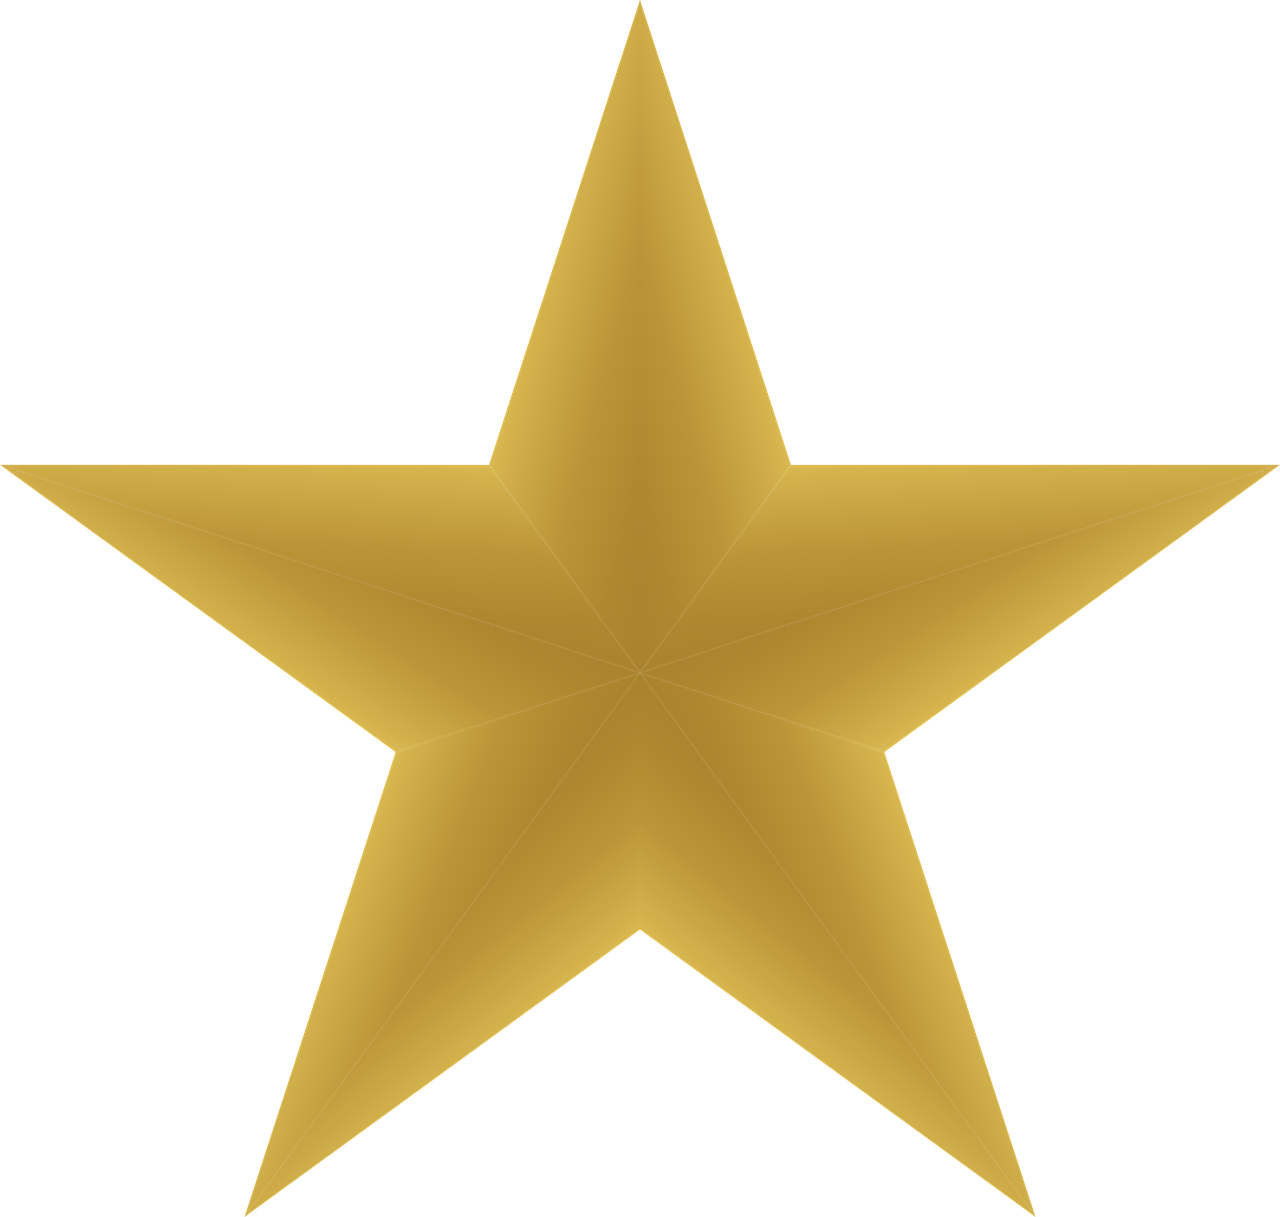 Autotempo, avis, étoile, témoignage